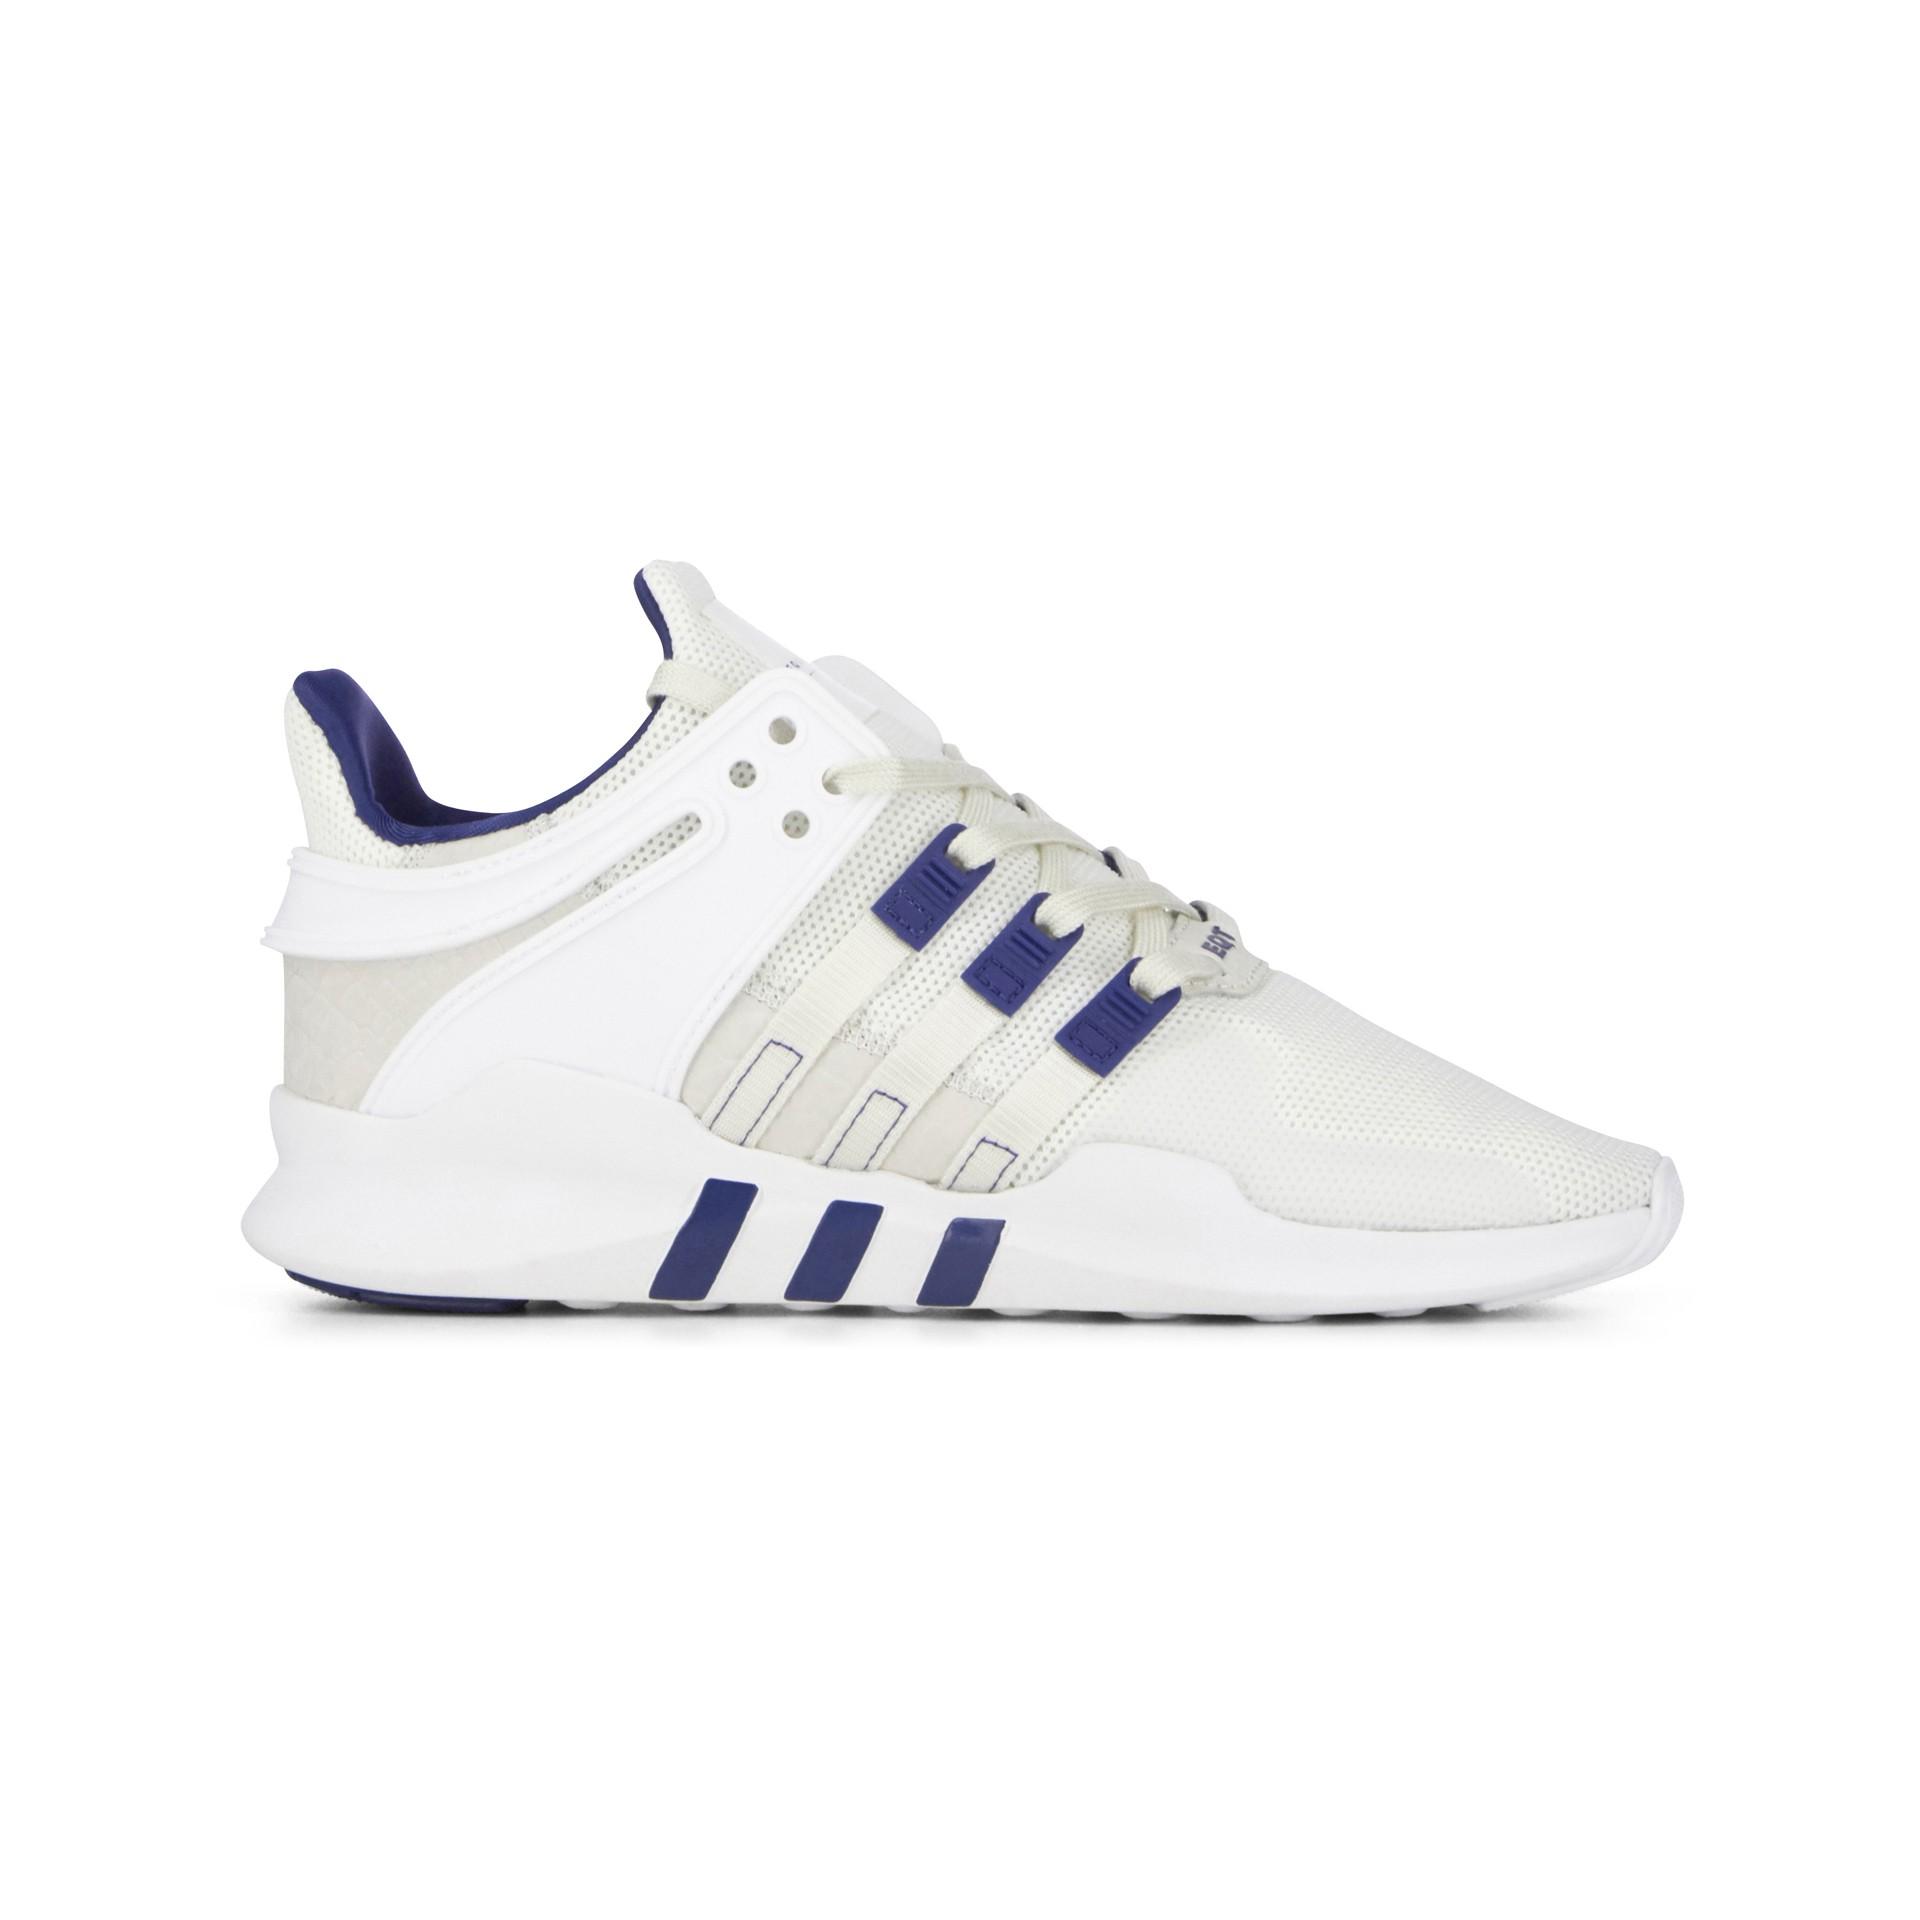 new product 9f930 5c51d basket adidas junior soldes